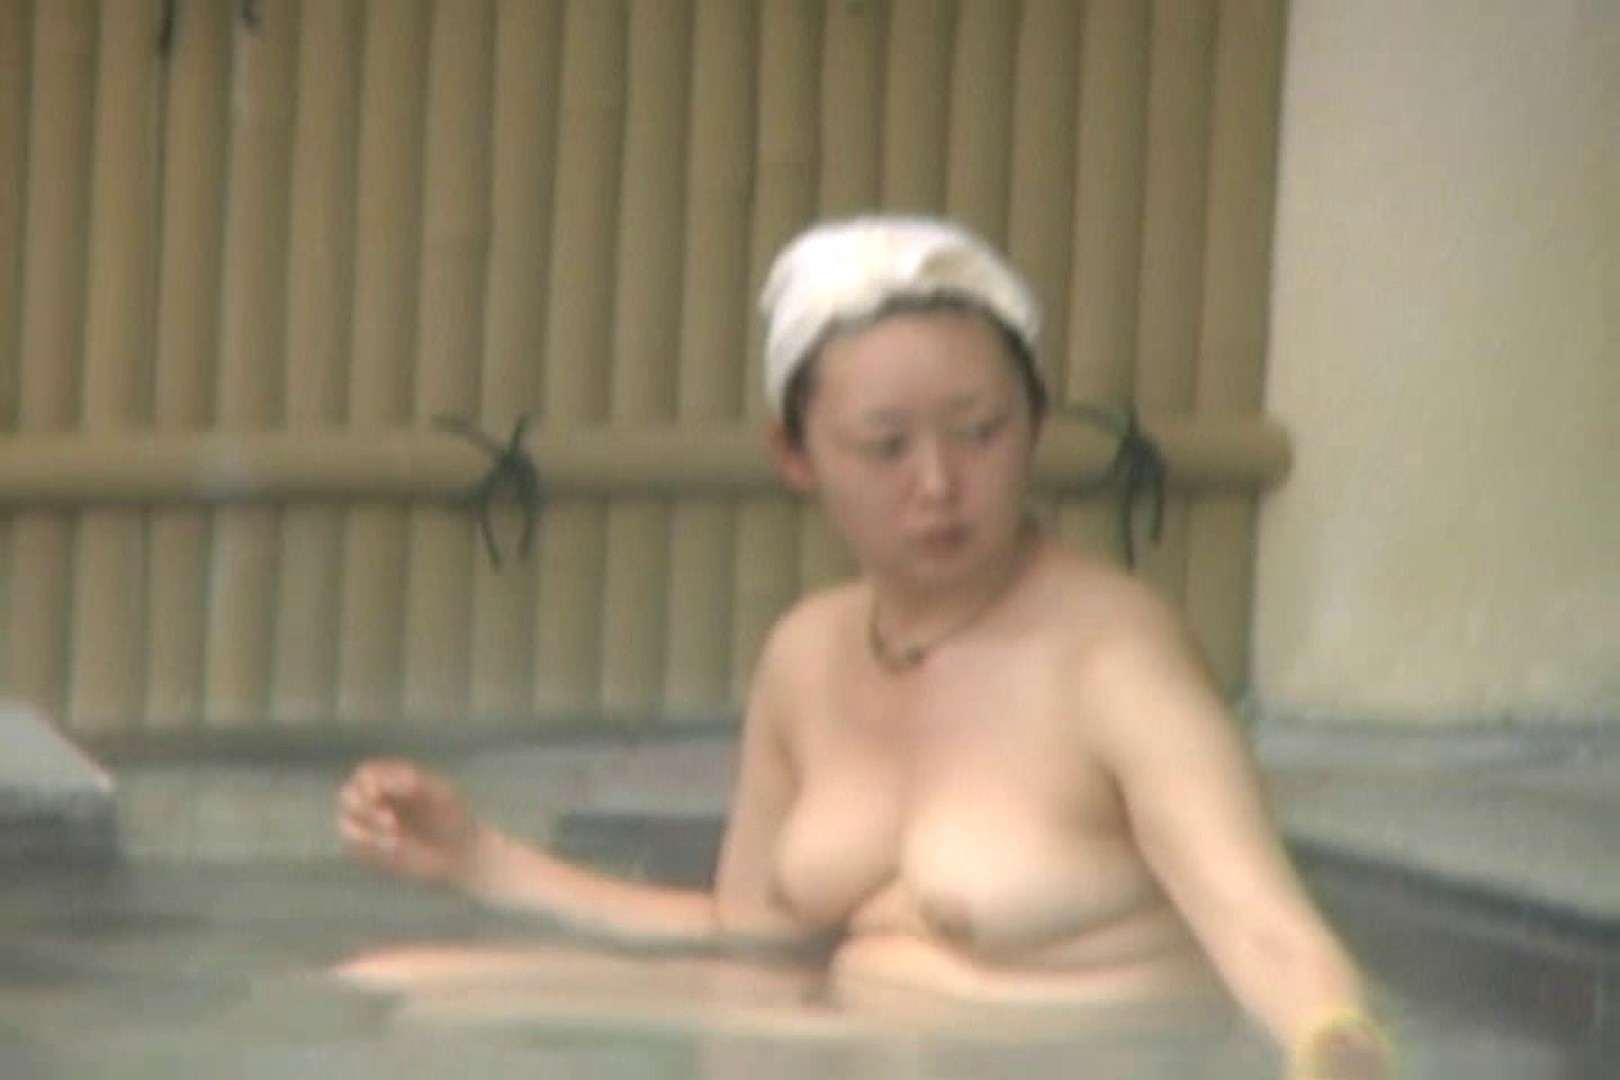 Aquaな露天風呂Vol.564 OL  87連発 65